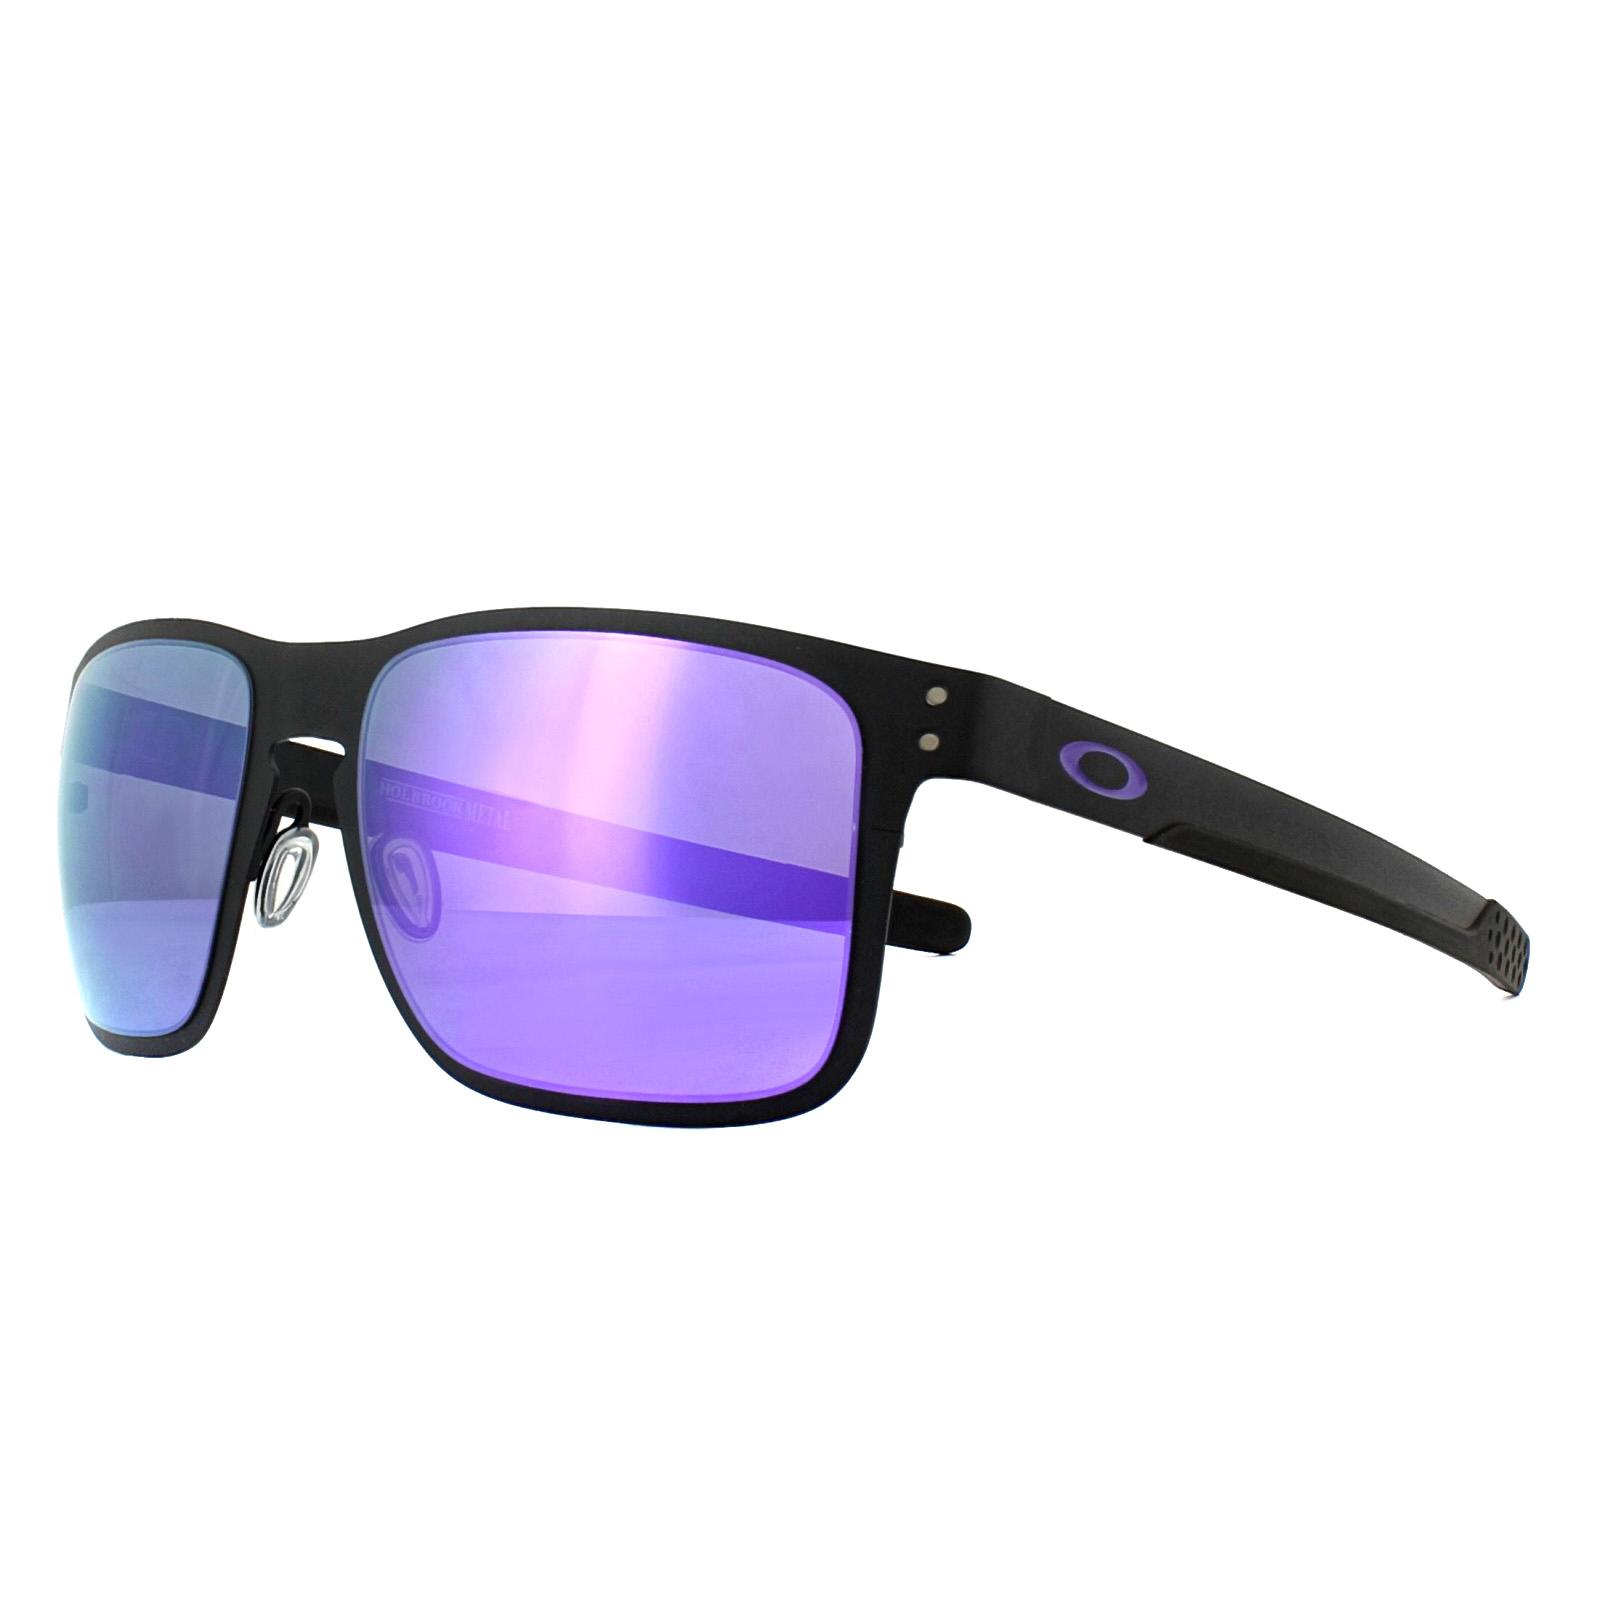 6a686bd87d3 Details about Oakley Sunglasses Holbrook Metal OO4123-14 Matt Black Violet  Iridium